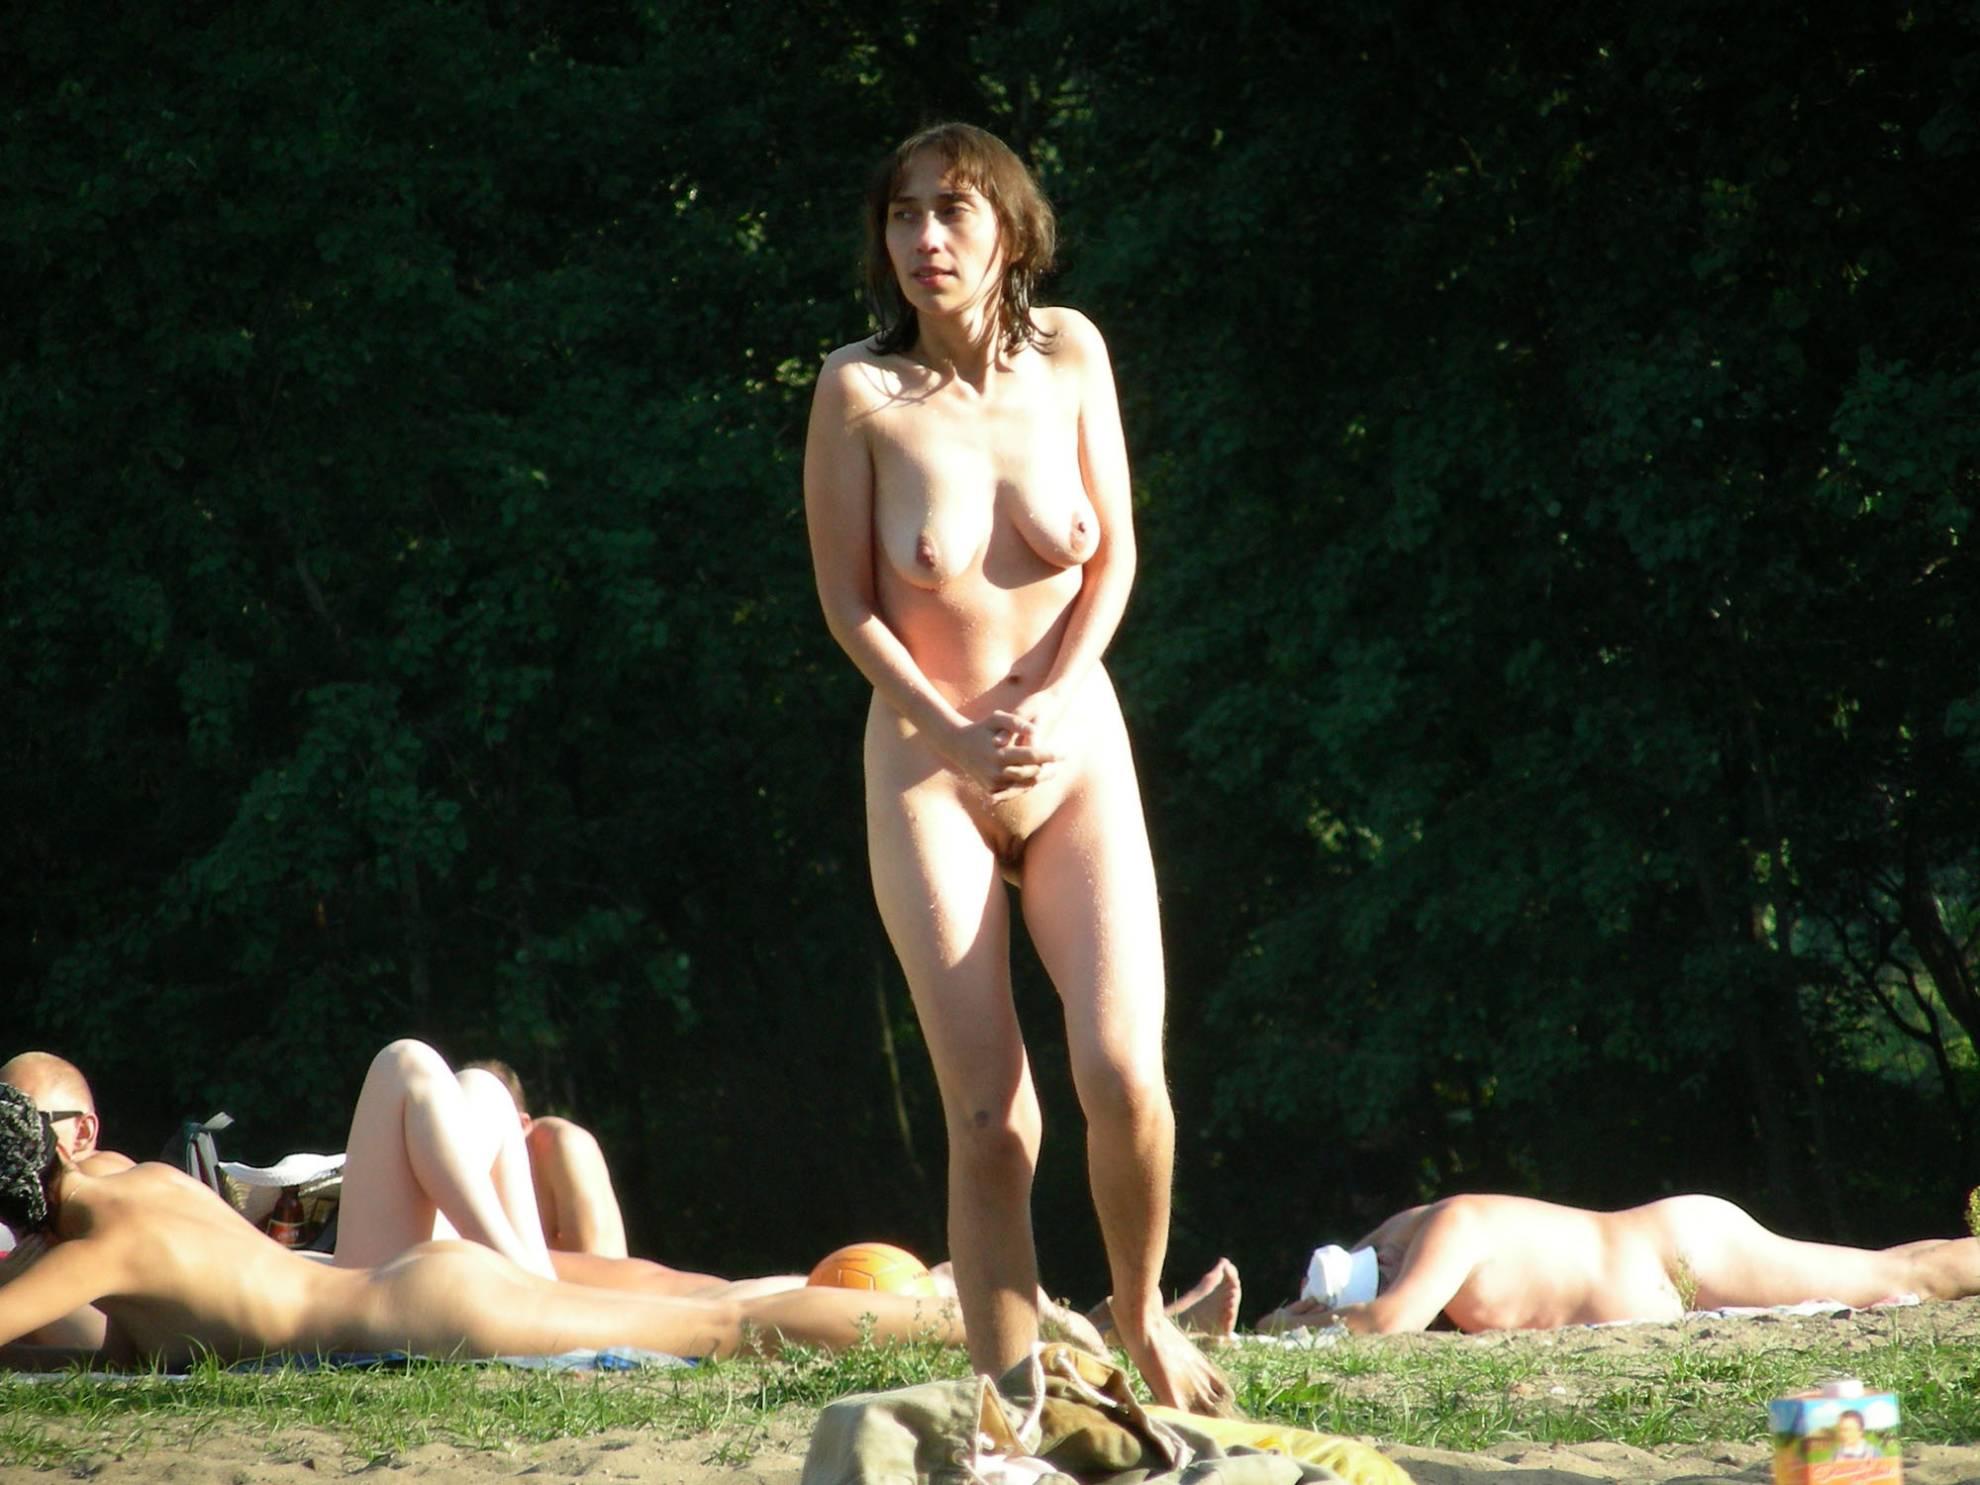 Apologise, Nudist j consider